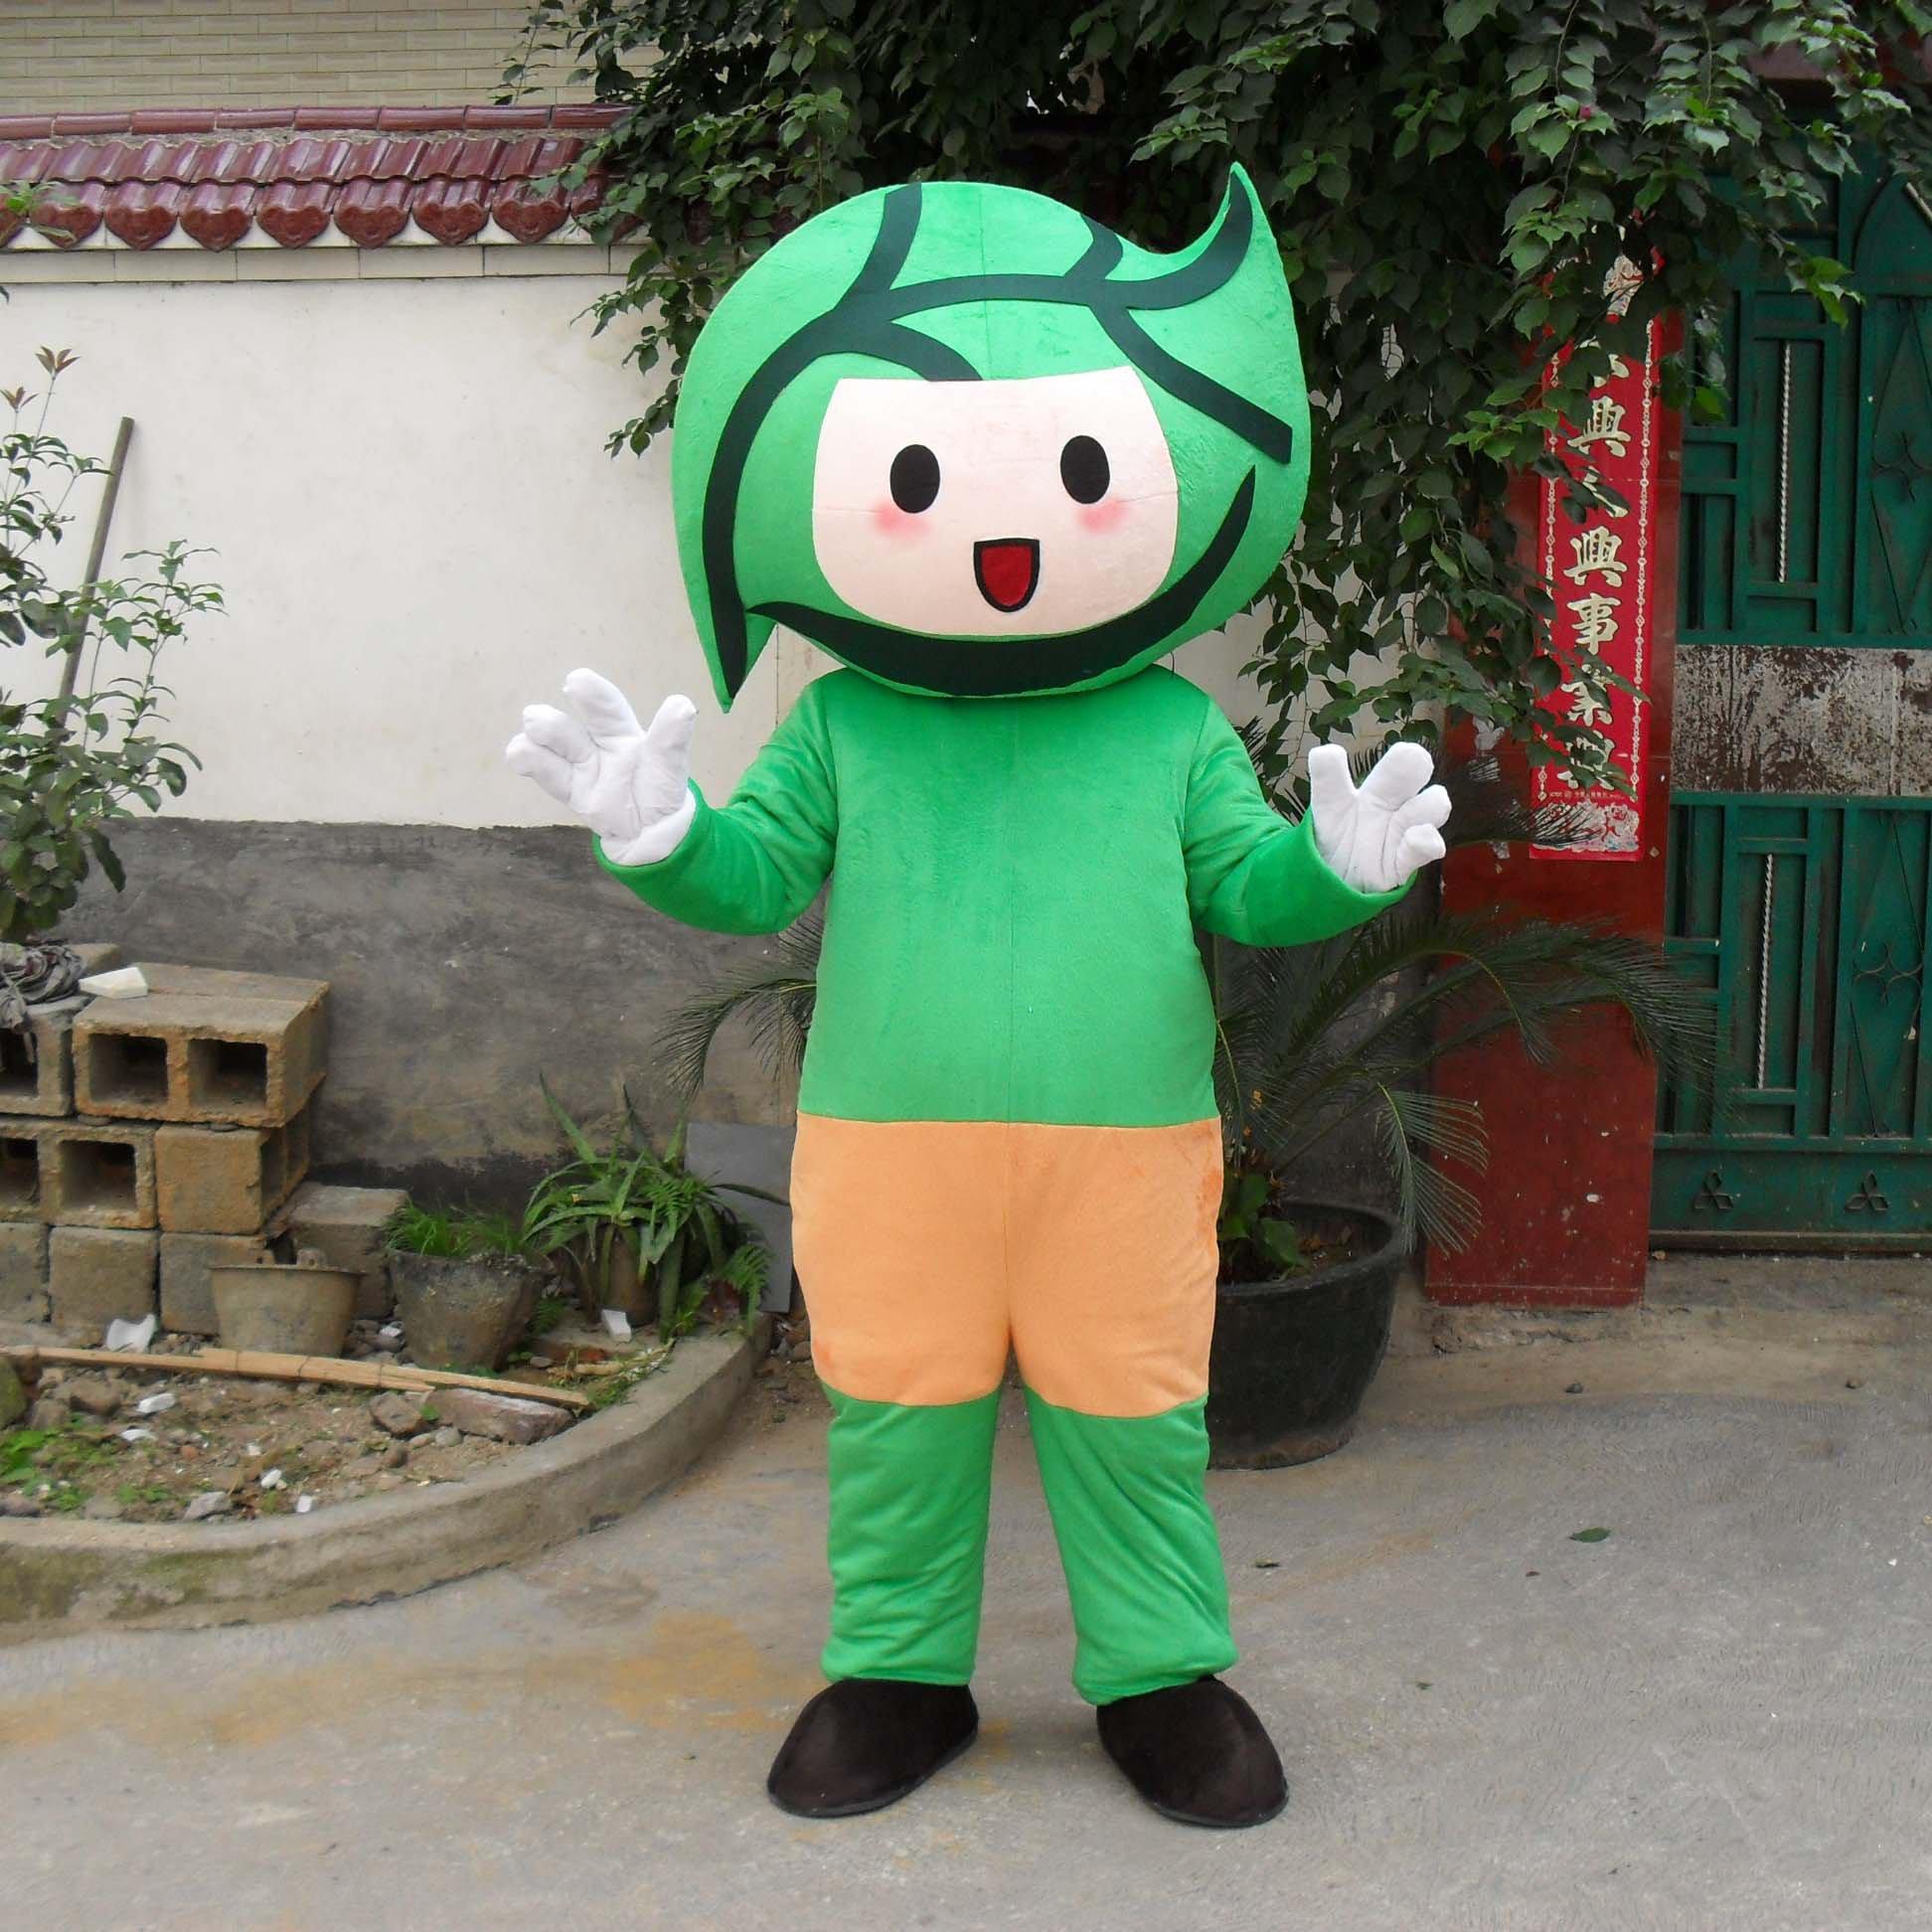 Leaf Cartoon Doll Clothing Cartoon Walking Doll Clothing Cartoon Show Clothing Doll Dress Green Leaves Mascot Costume